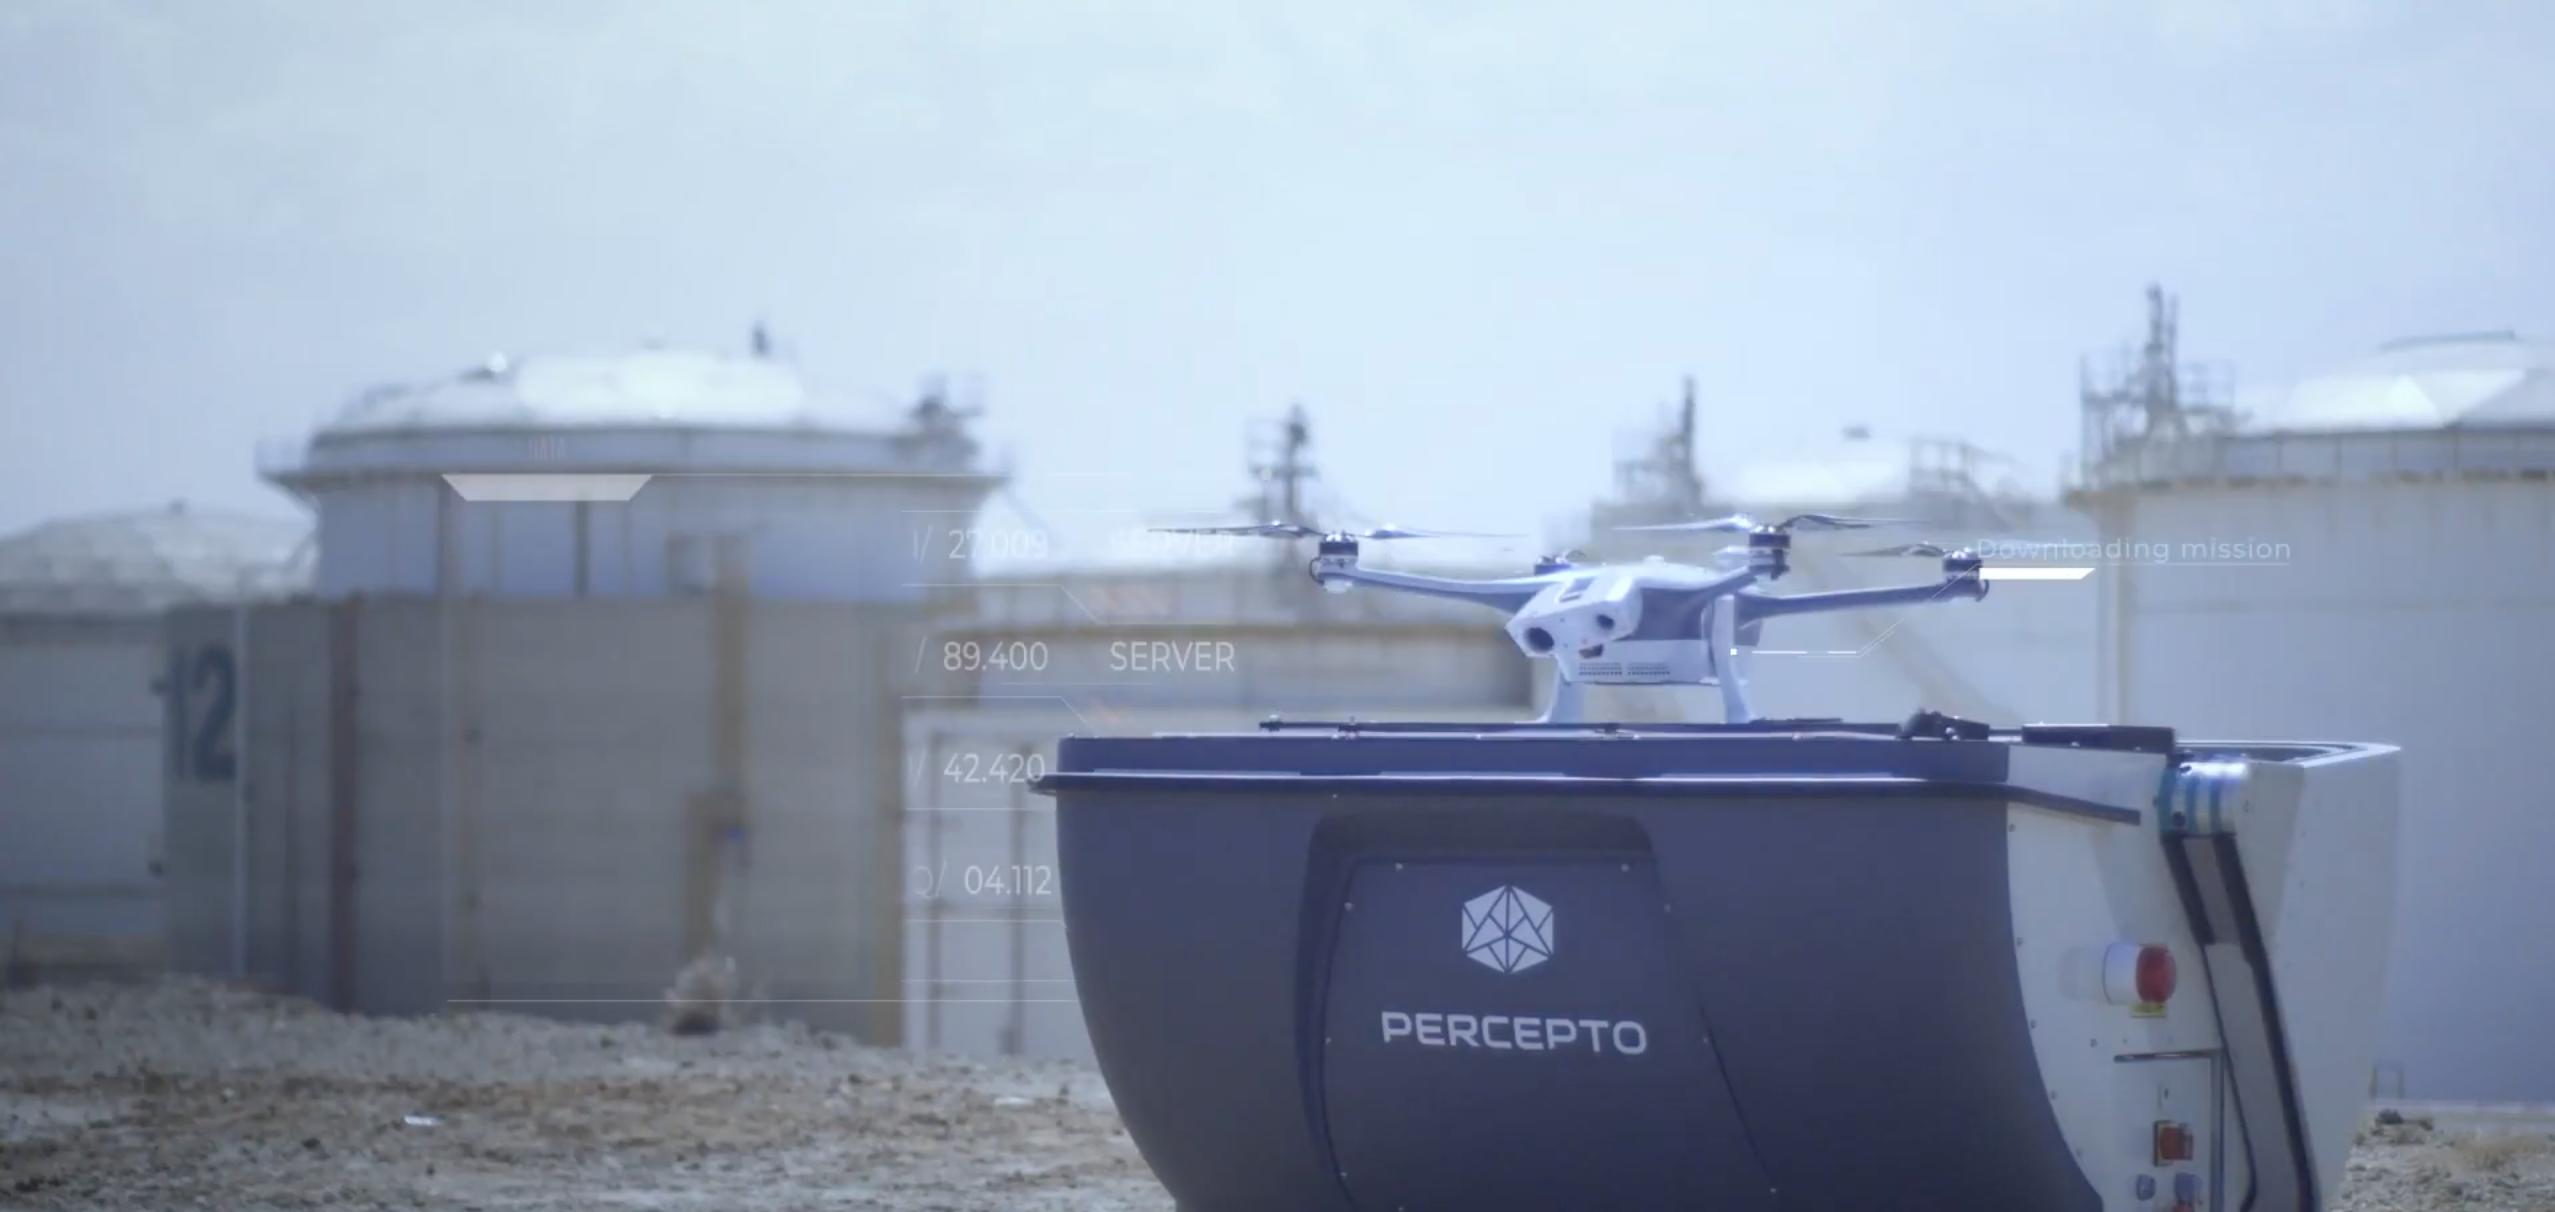 Le Sparrow 1 est le drone de Percepto.